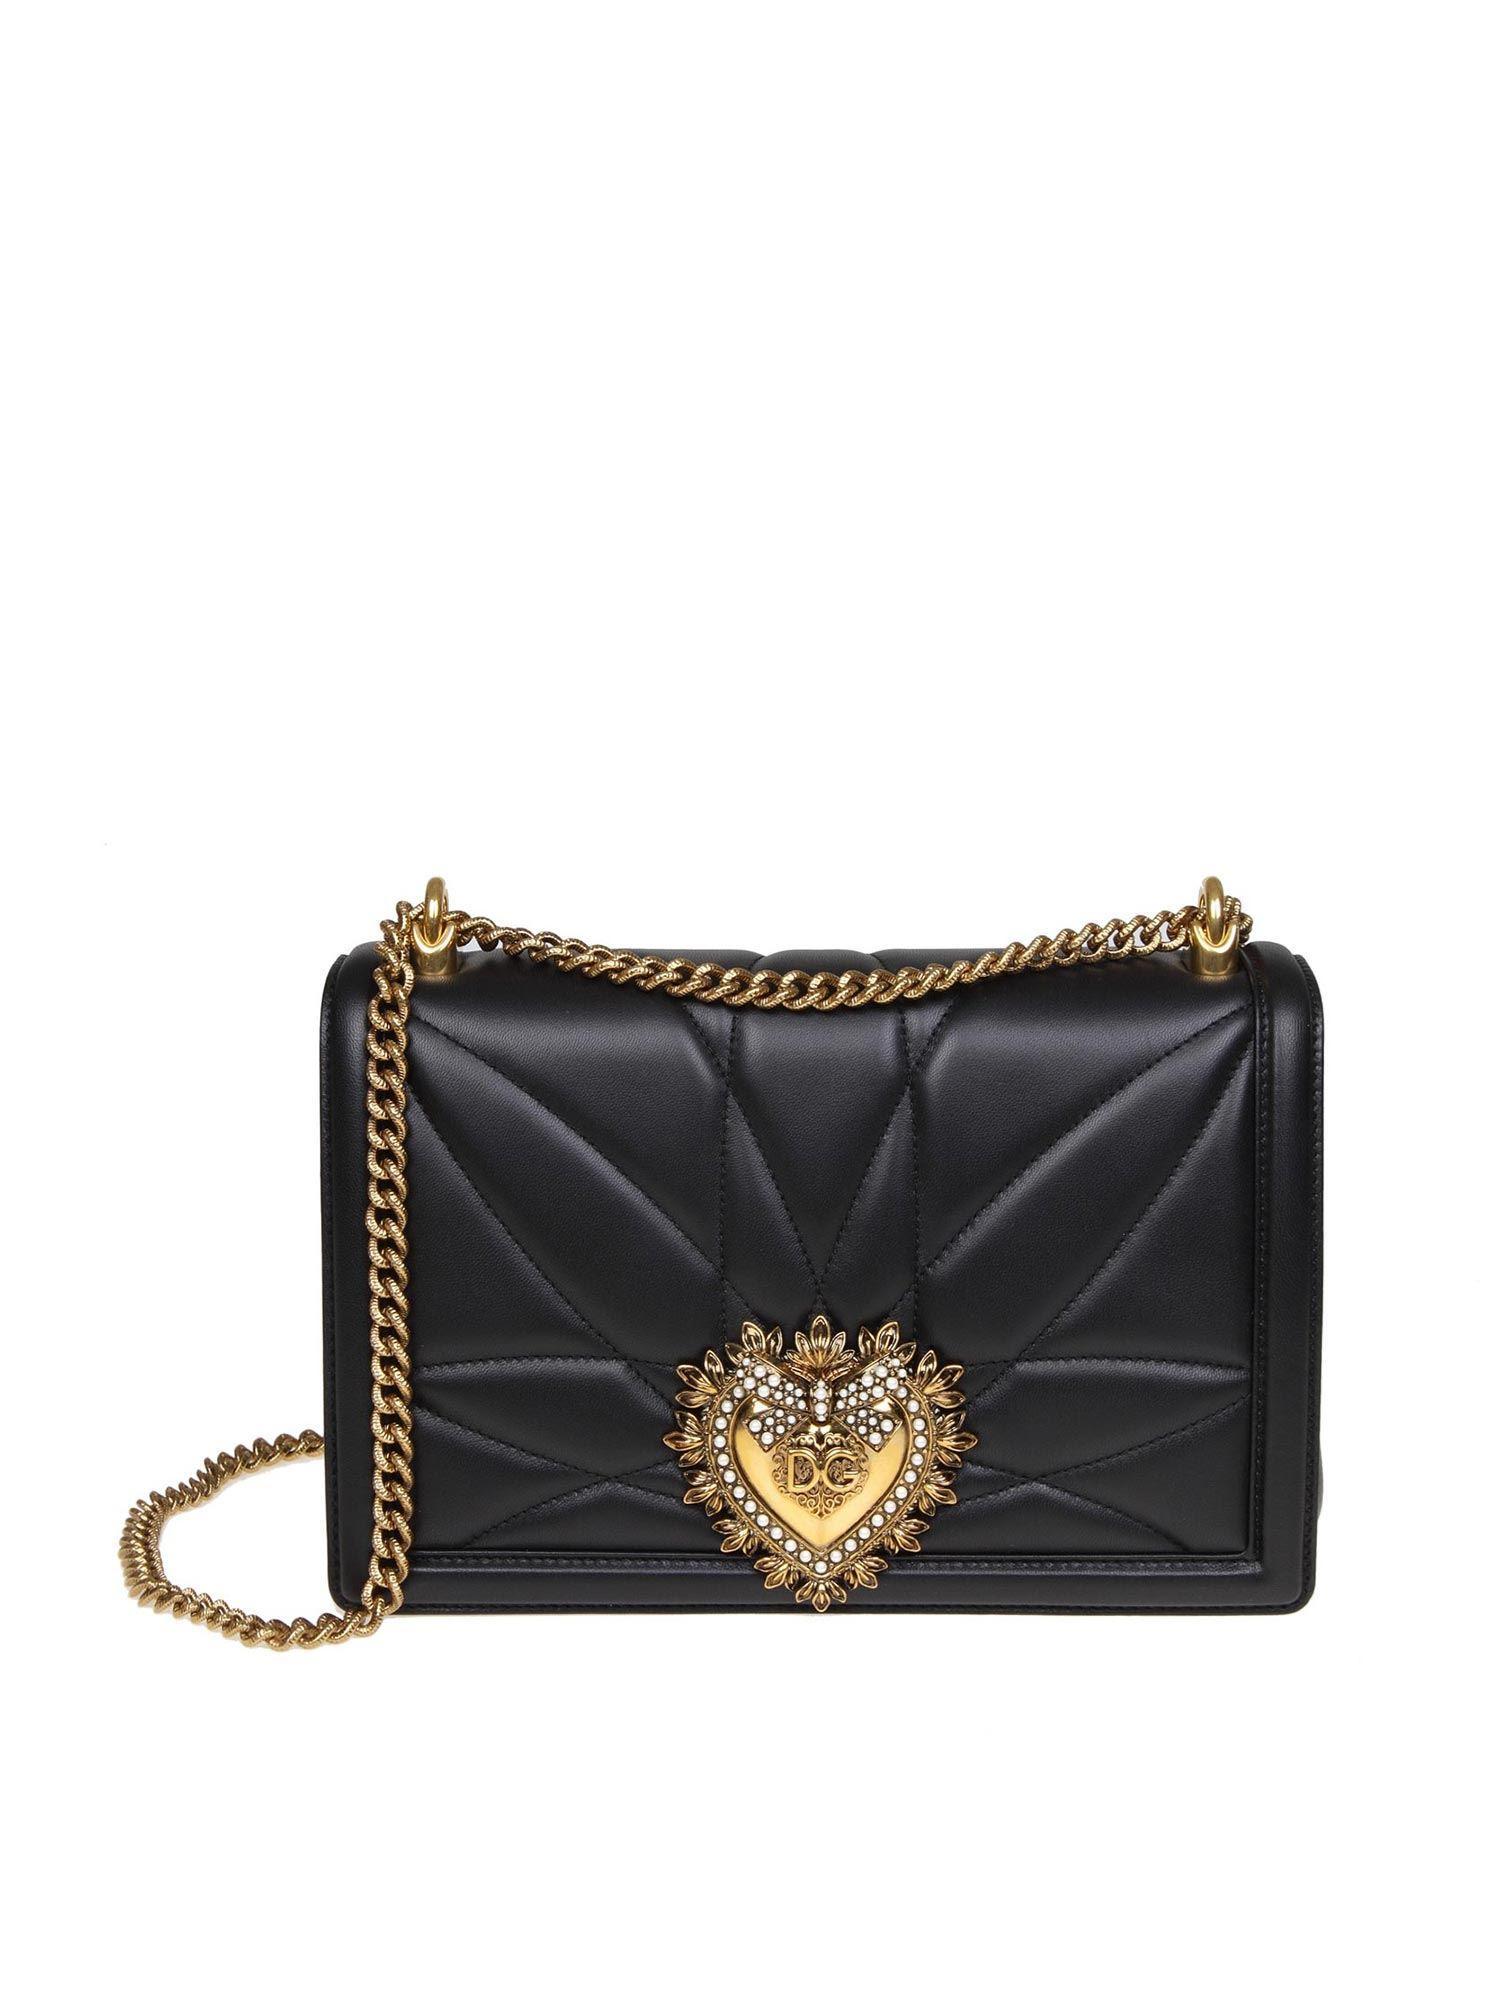 8f21fdaeb6c0 Lyst - Dolce   Gabbana Black Bag In Nappa Devotion D g in Black ...